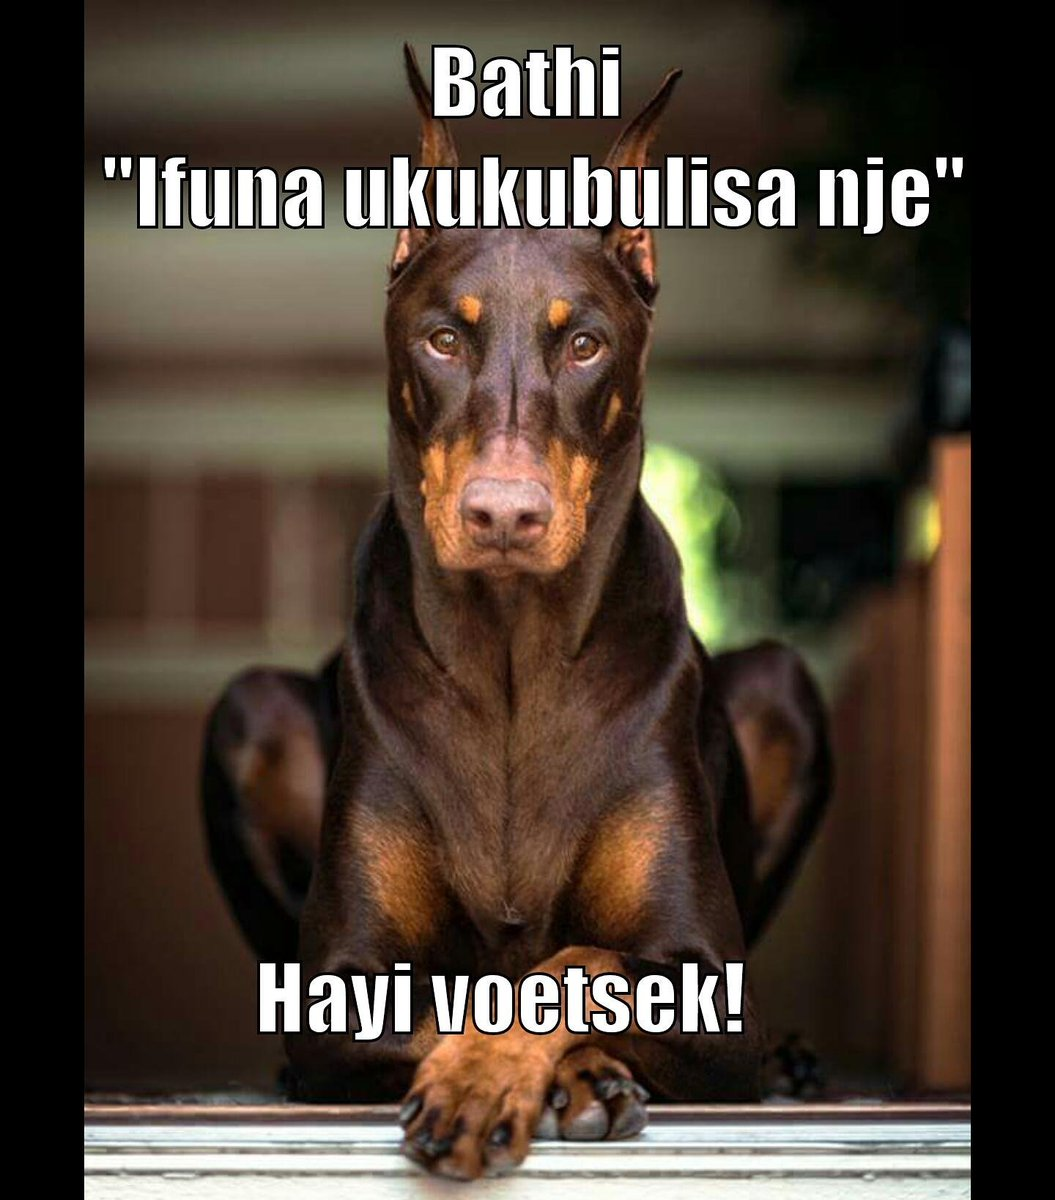 Xhosa Isixhosa Xhosamemes Southafrica Southafrican Meme Memes Funny Joke Jokes Humour Xhosajustkiddingpic Twitter Com Gdzhhwtly